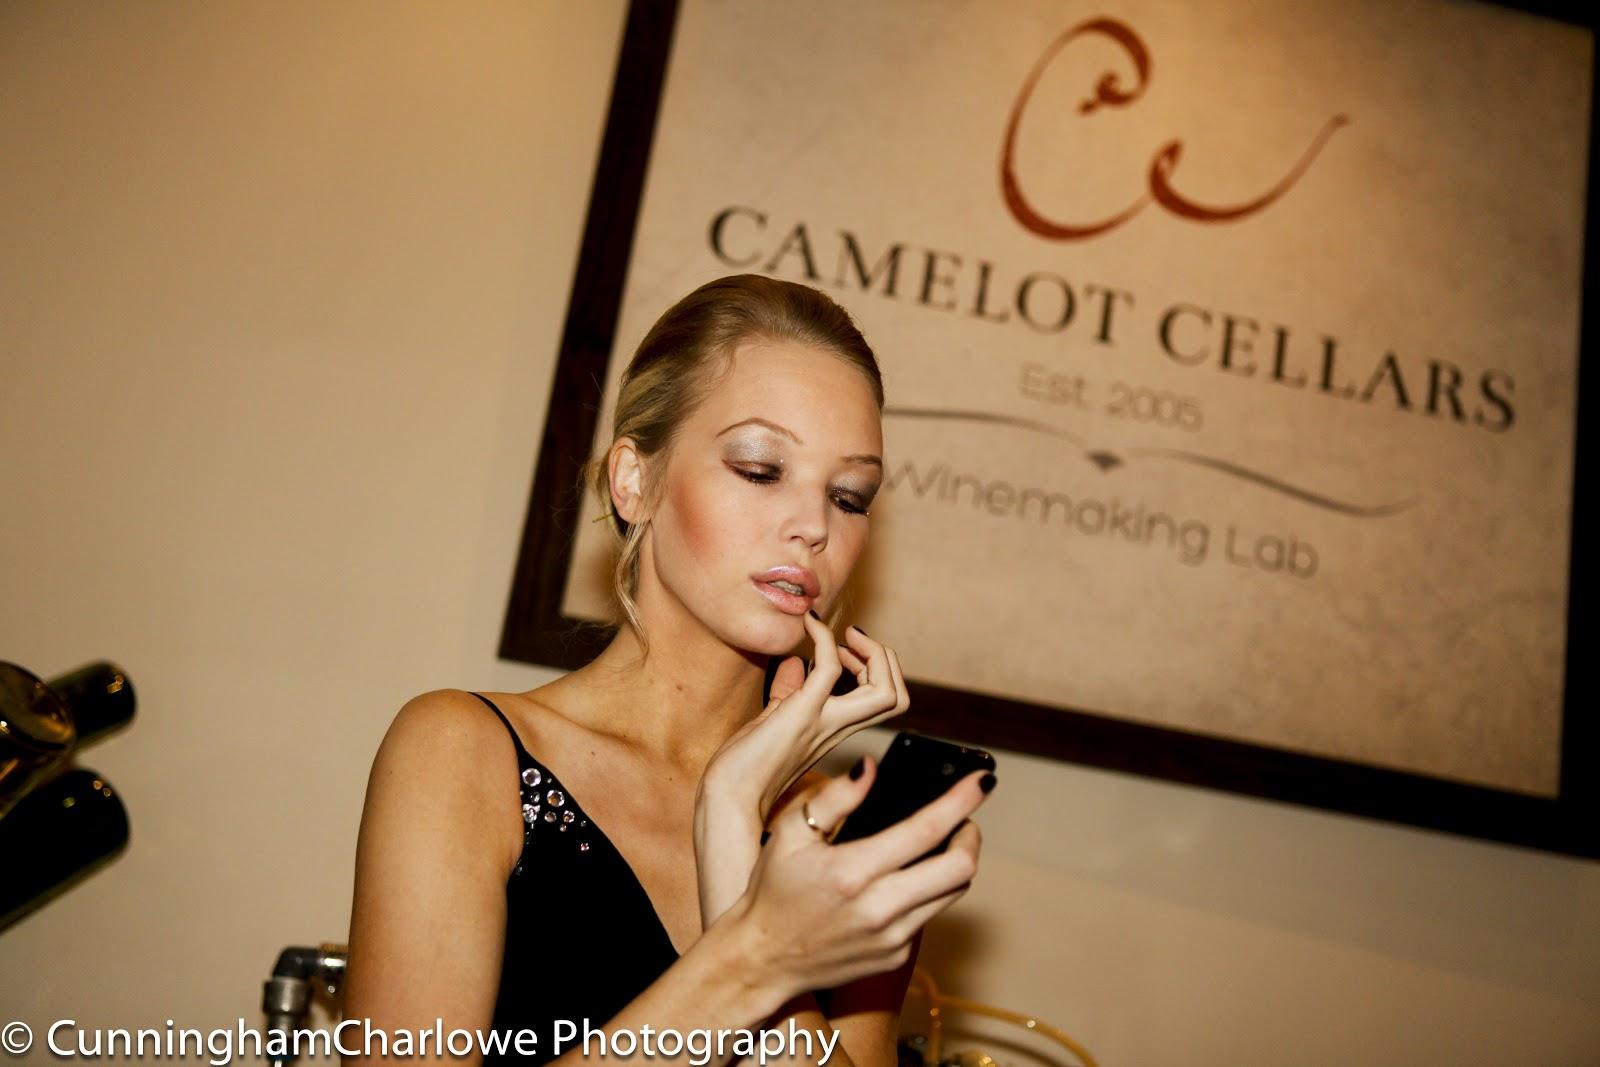 http://4.bp.blogspot.com/-4SSzlifxMYE/UH7EsfnOEmI/AAAAAAAADoA/-XBFKR46DUc/s1600/SC1333+-+CMH+Fashion+Week+-+Thomas+McClure+-+Camelot+Cellar+-+Event+Photography+-+Nicole+-+10-15-12+-0009.jpg